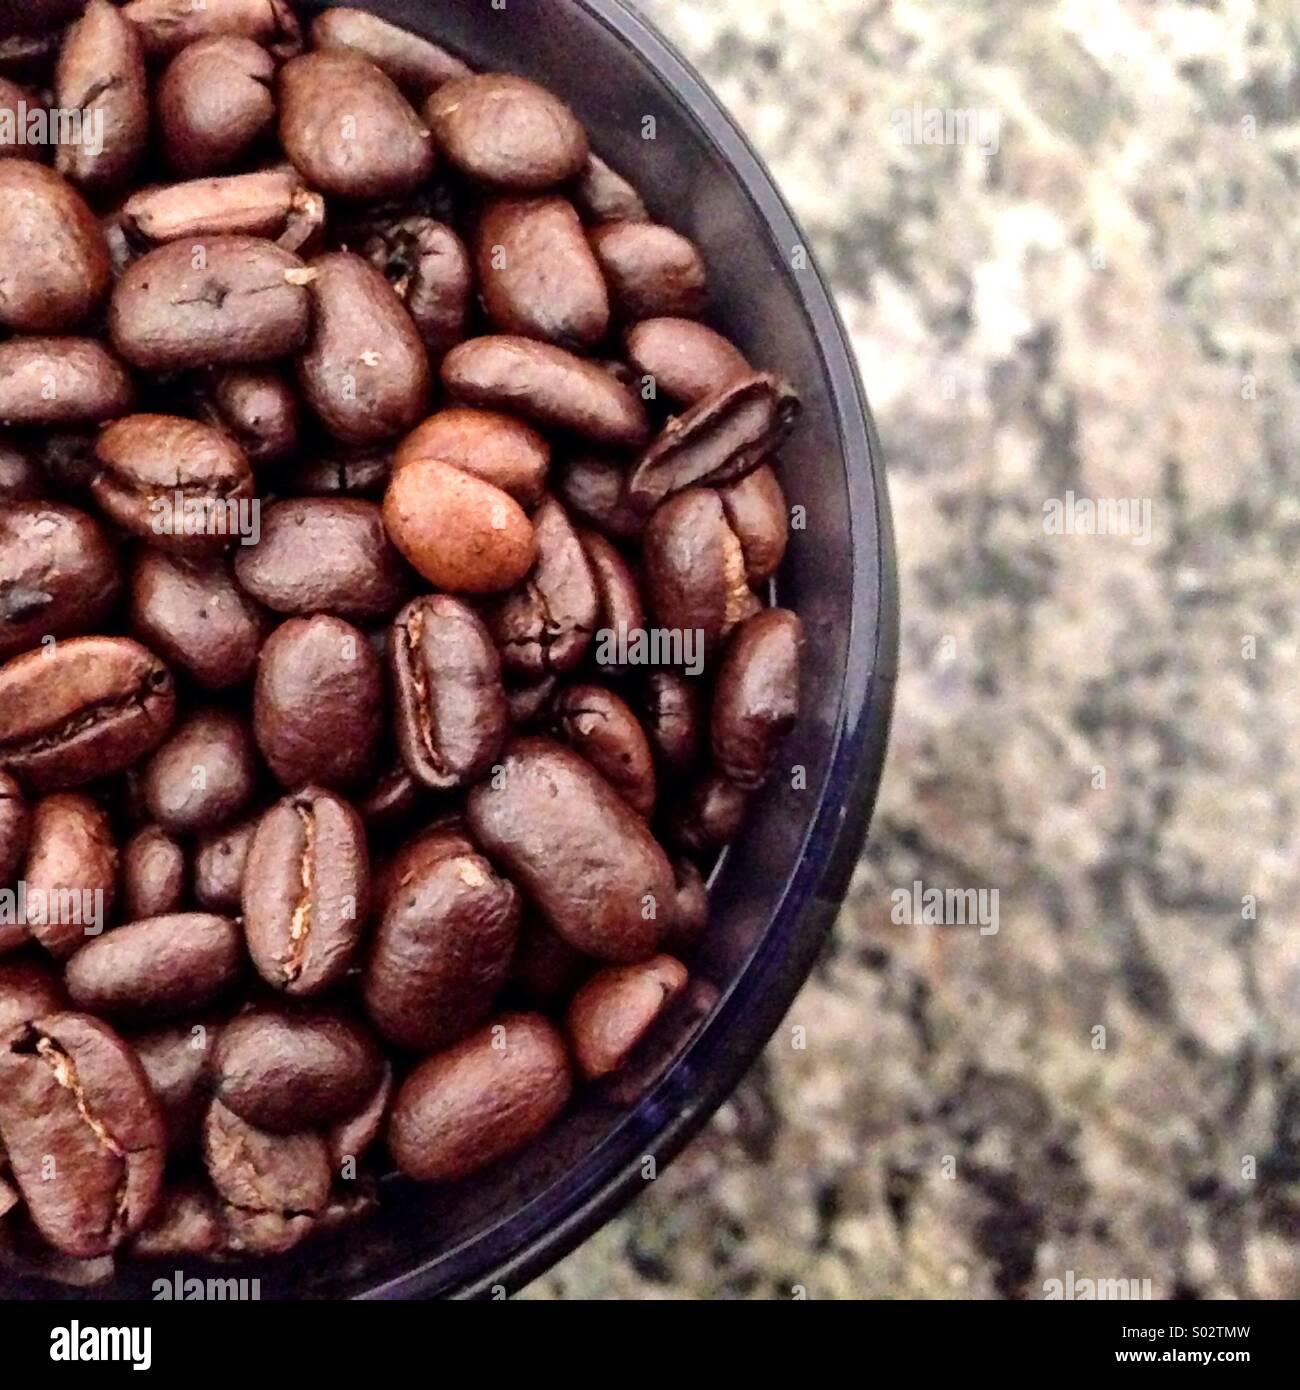 Coffee beans. - Stock Image